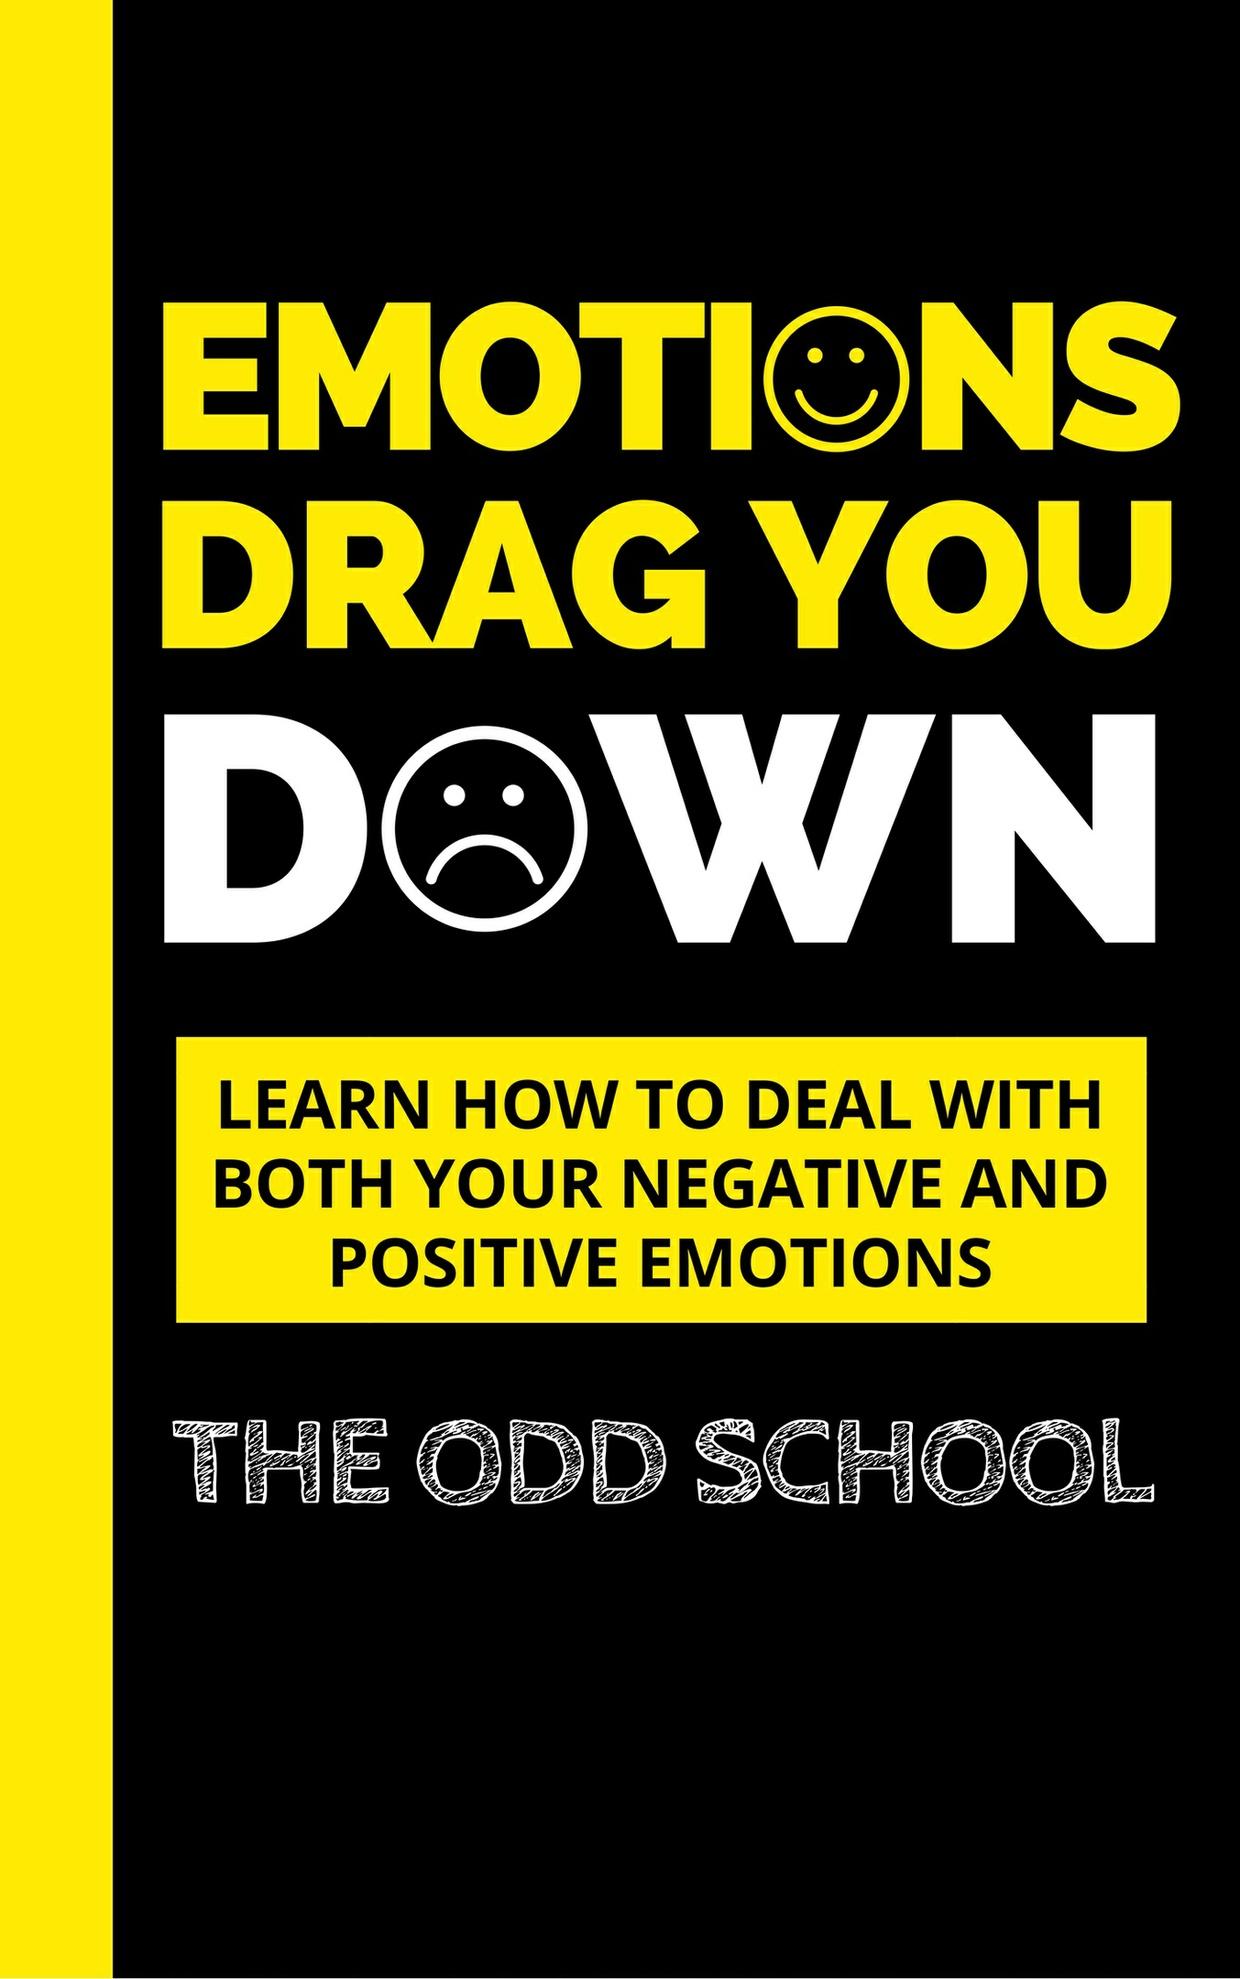 Emotions Drag You Down